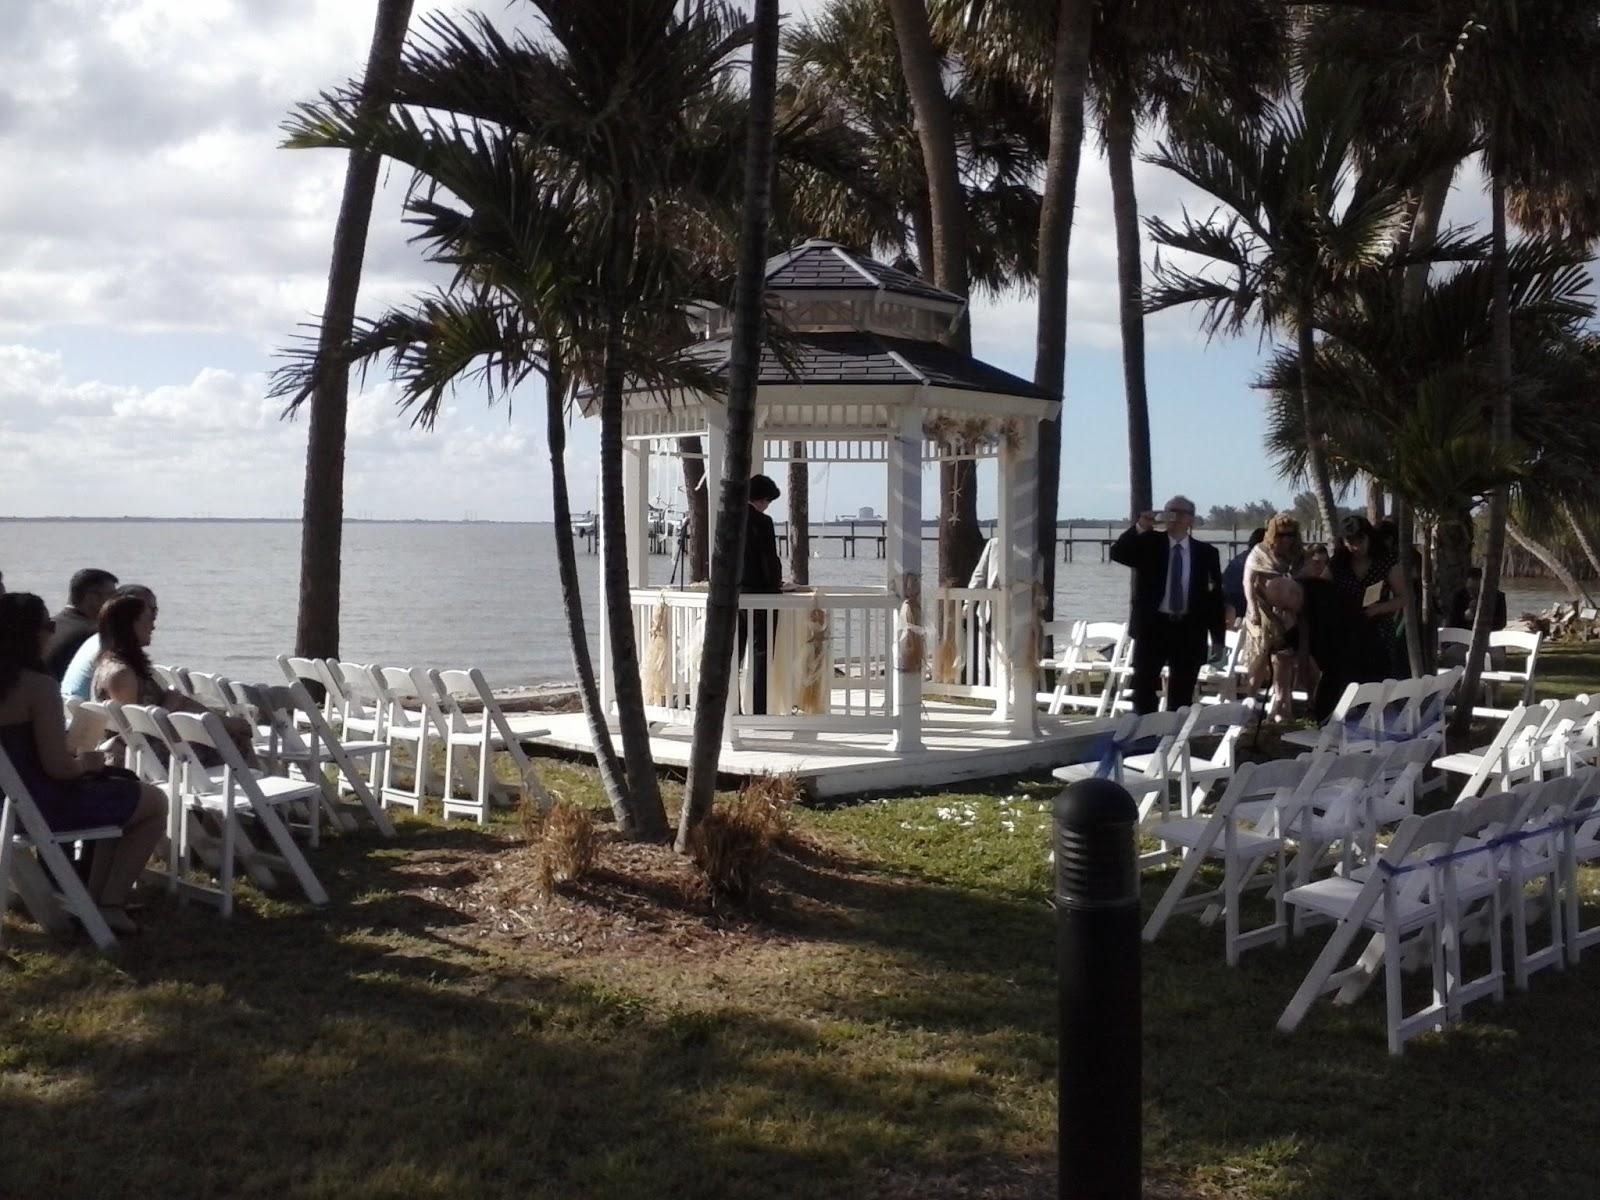 South Florida Gig Log And Event DJ Venues Pietros On The River Jensen Beach Hutchinson Island Wedding Venue